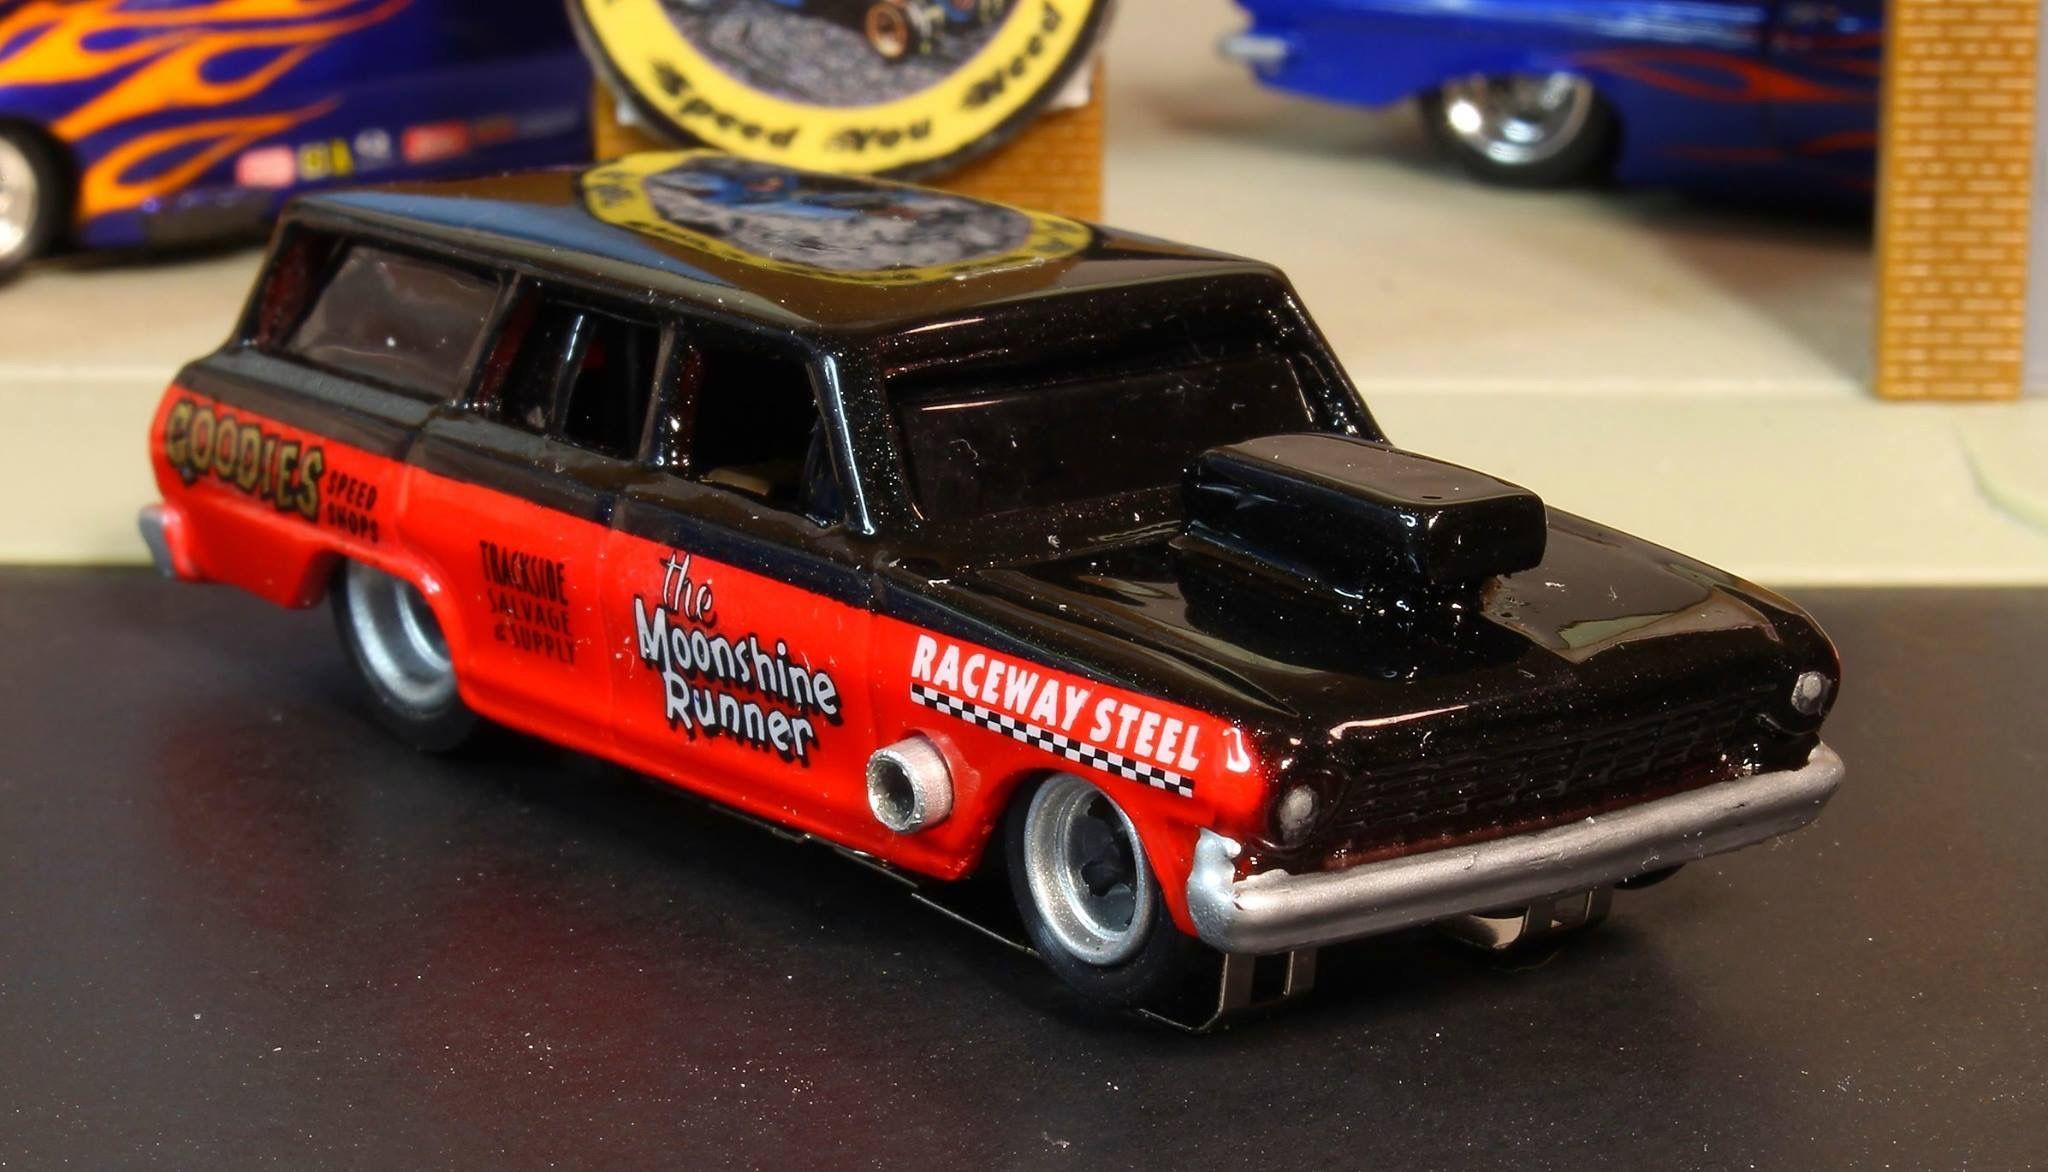 Pin By Dave Kumm On H O Scale Slot Car Drag Racing Slot Cars Ho Slot Cars Car Model